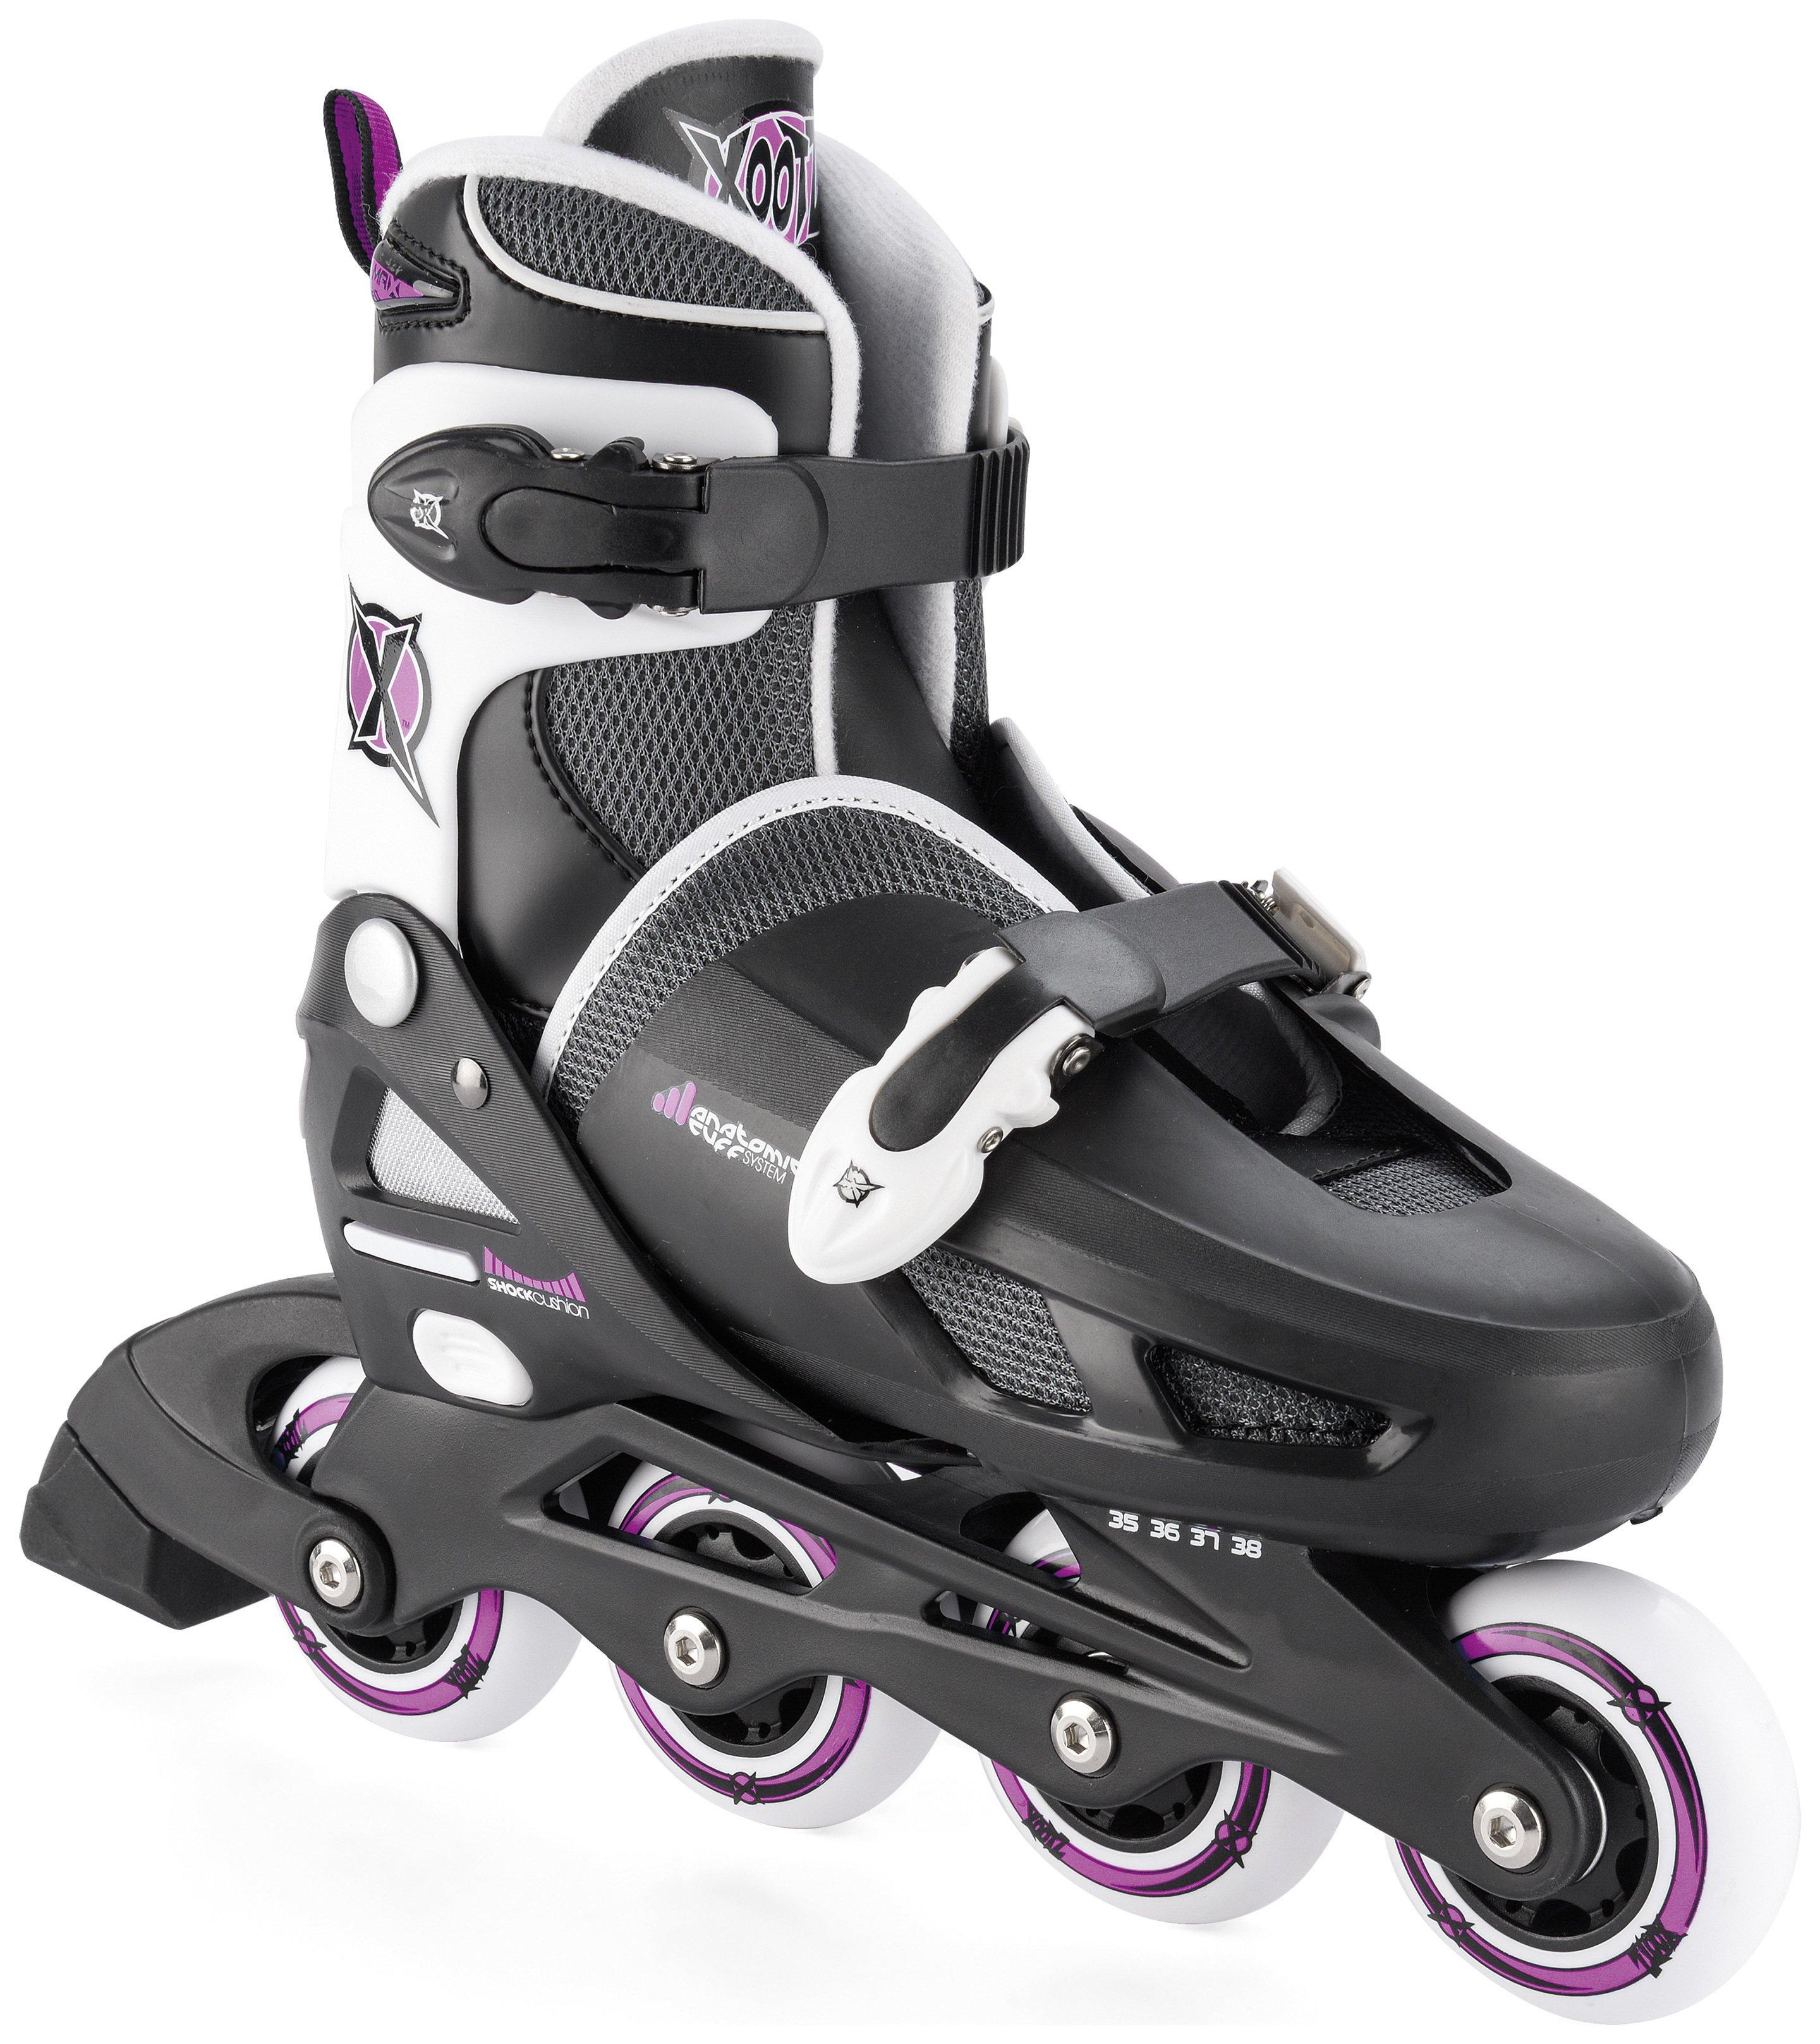 Xootz Inline Skates XY400P - Size 1-4.